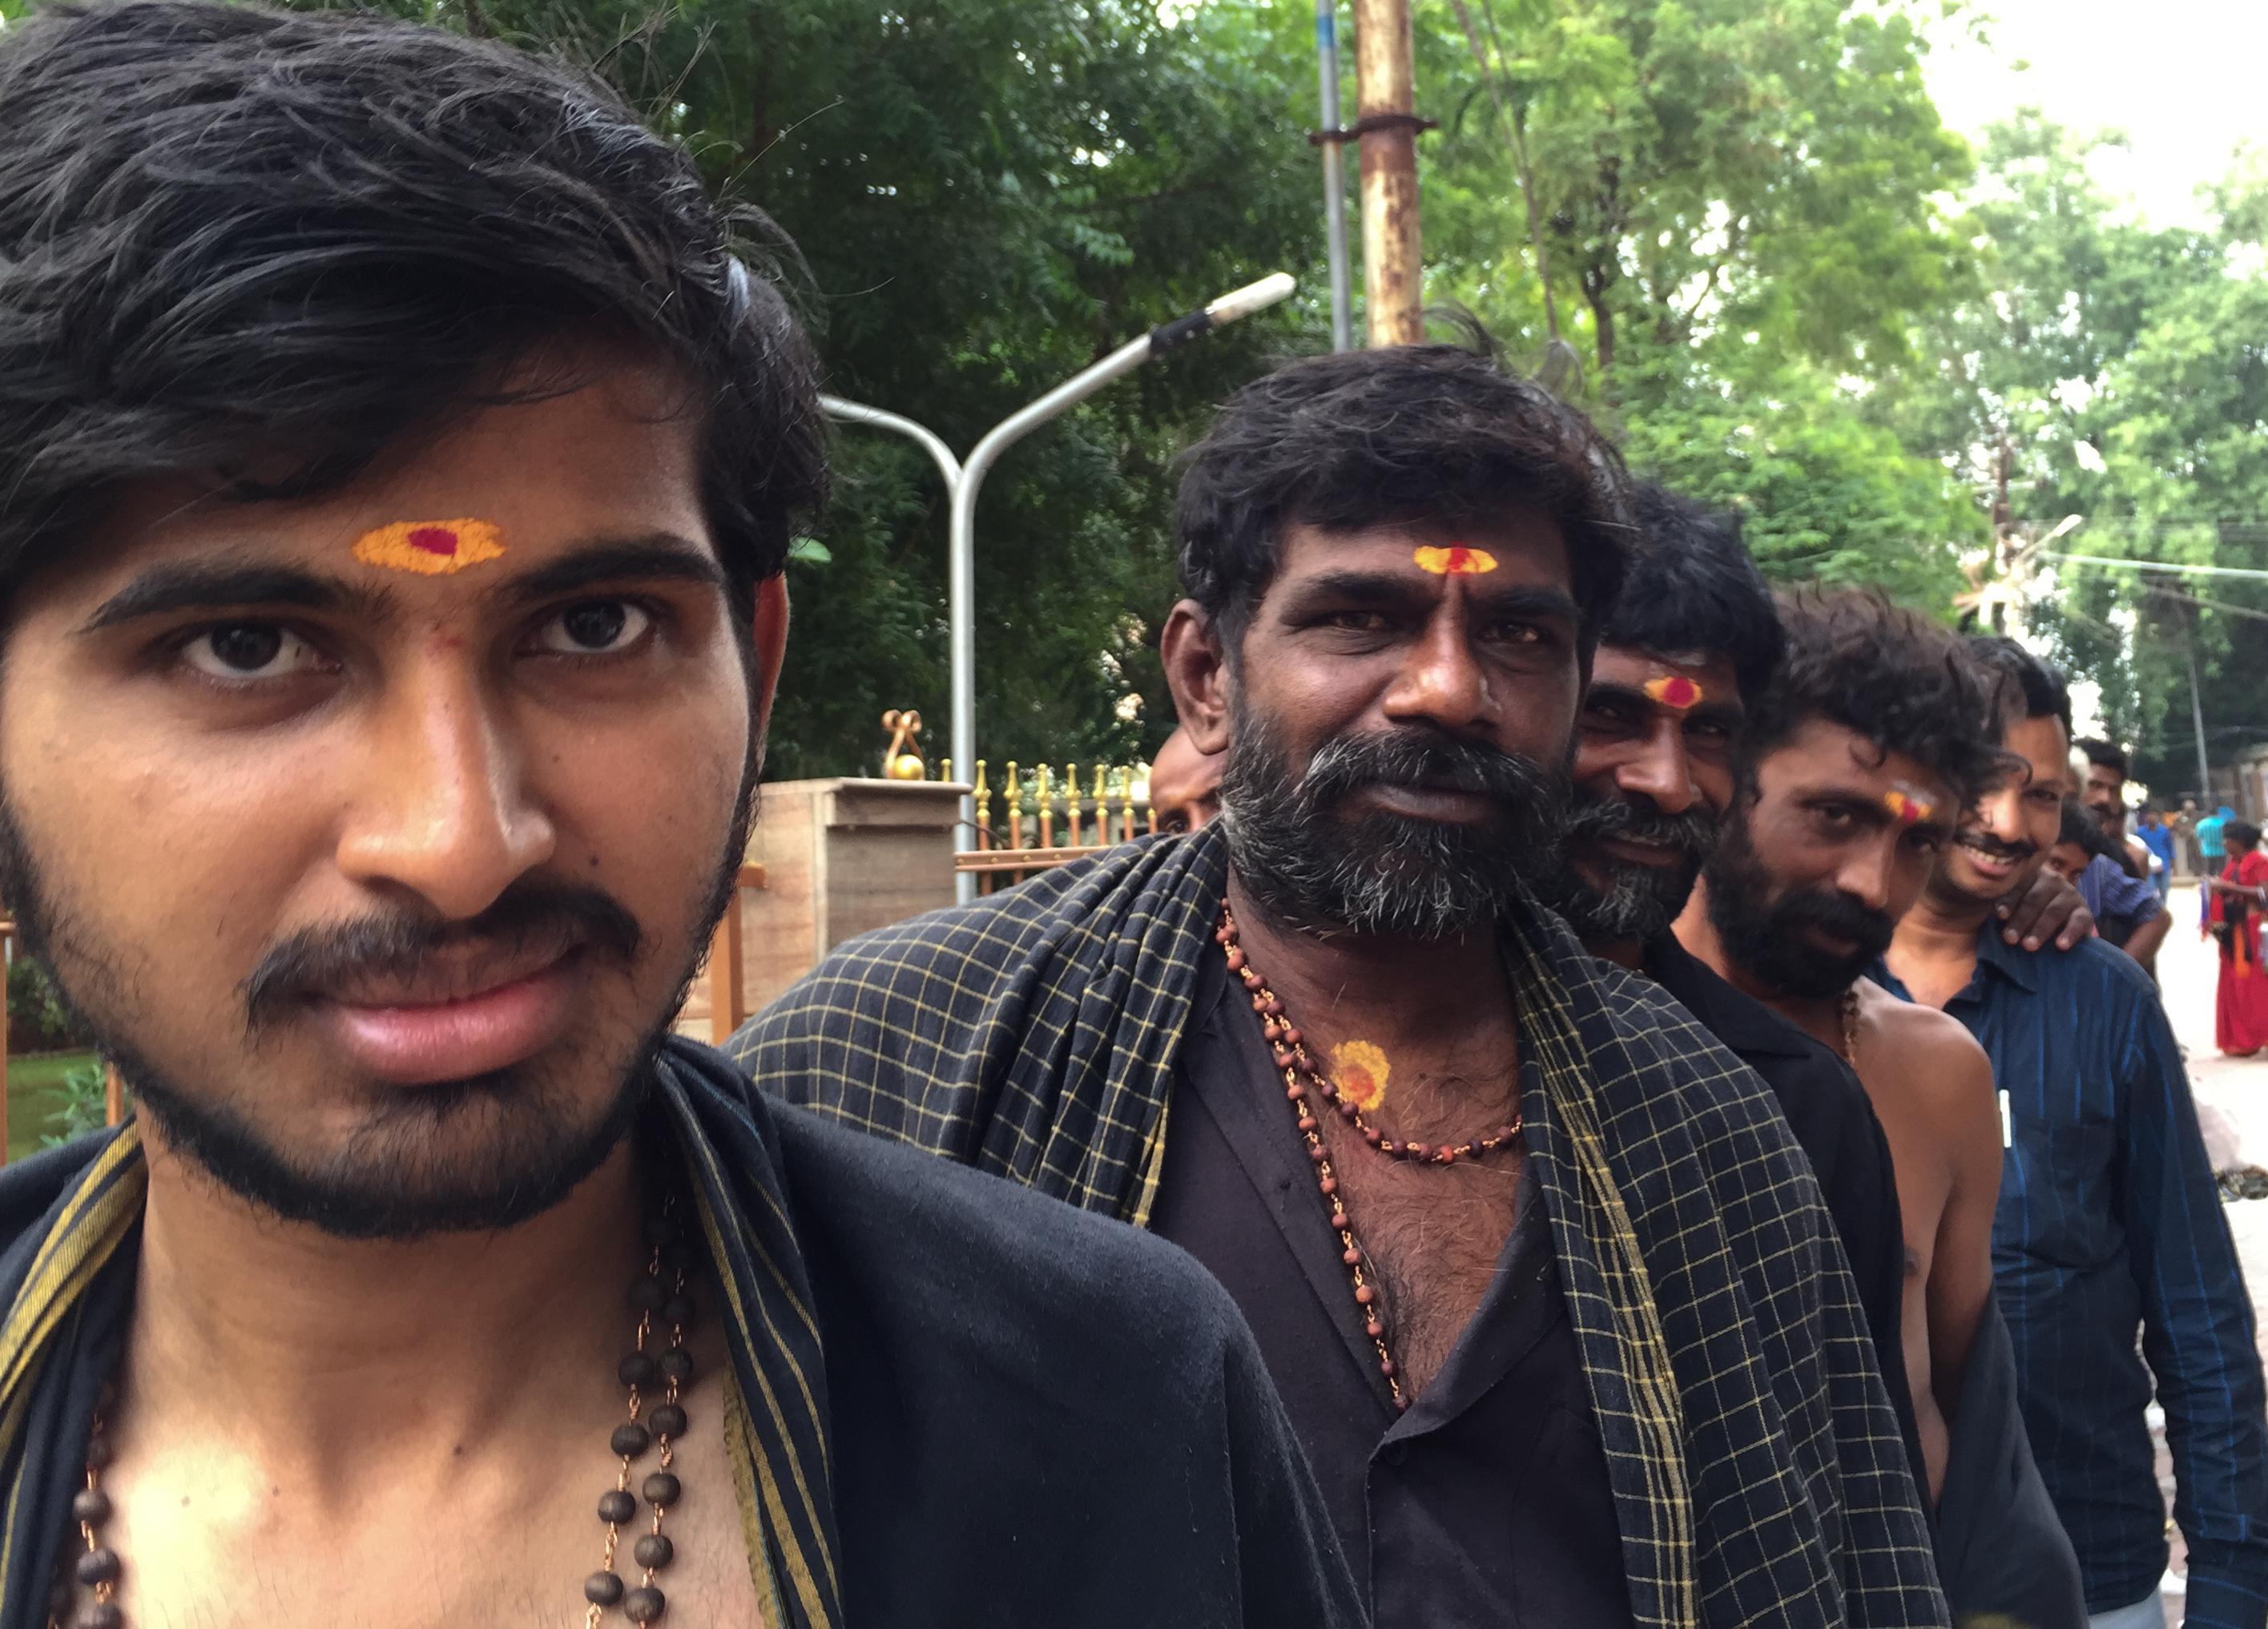 INDIEN Chennai Kanchipuram Tempel Menschen Tempel FINEST-onTour 2185.jpg